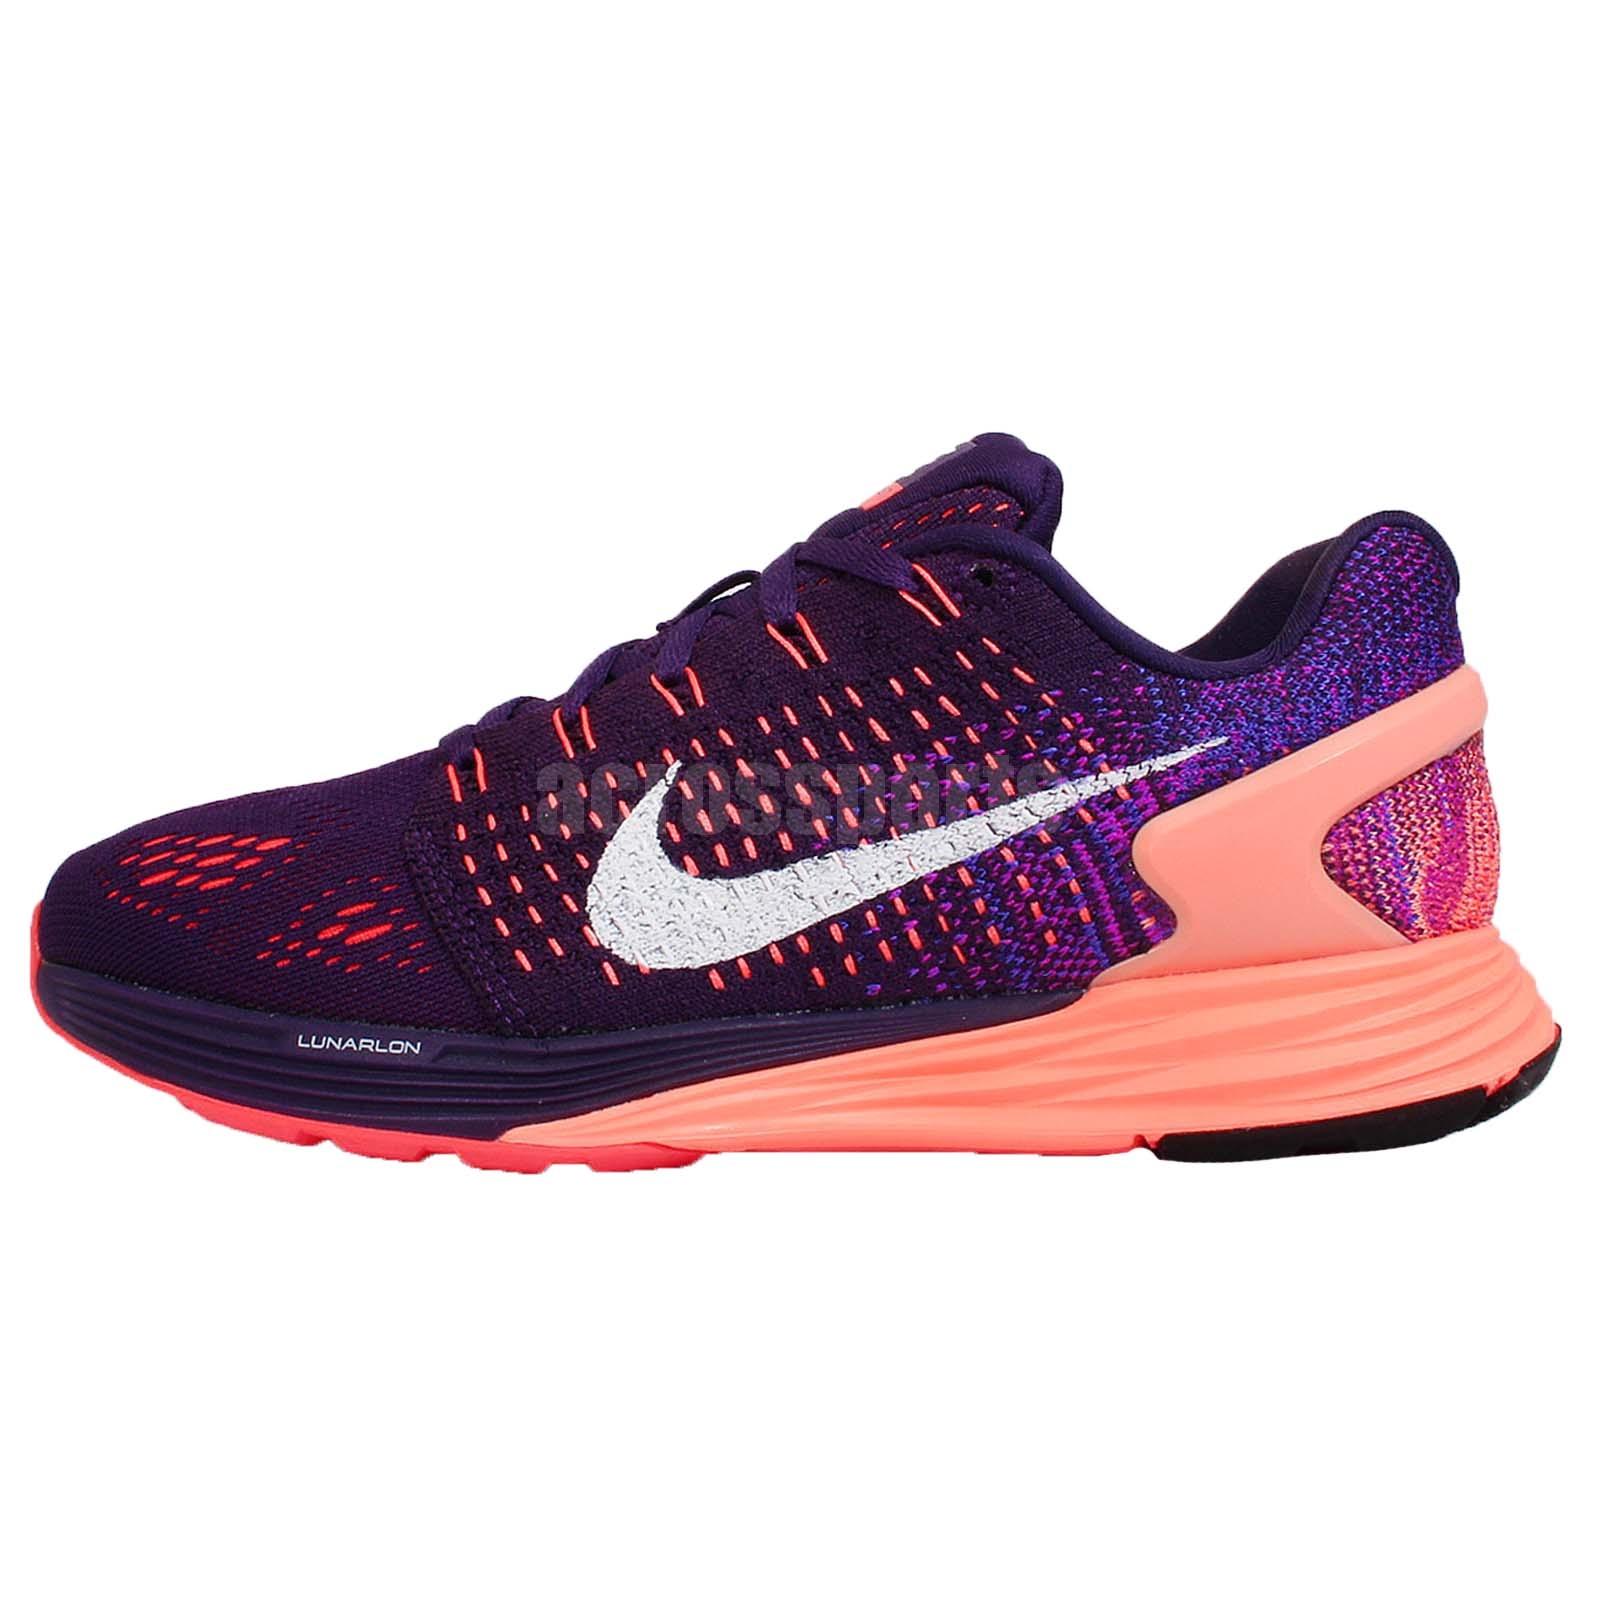 0bd28f9919a Wmns Nike Lunarglide 7 VII Flyknit Purple Orange Womens Running Shoes